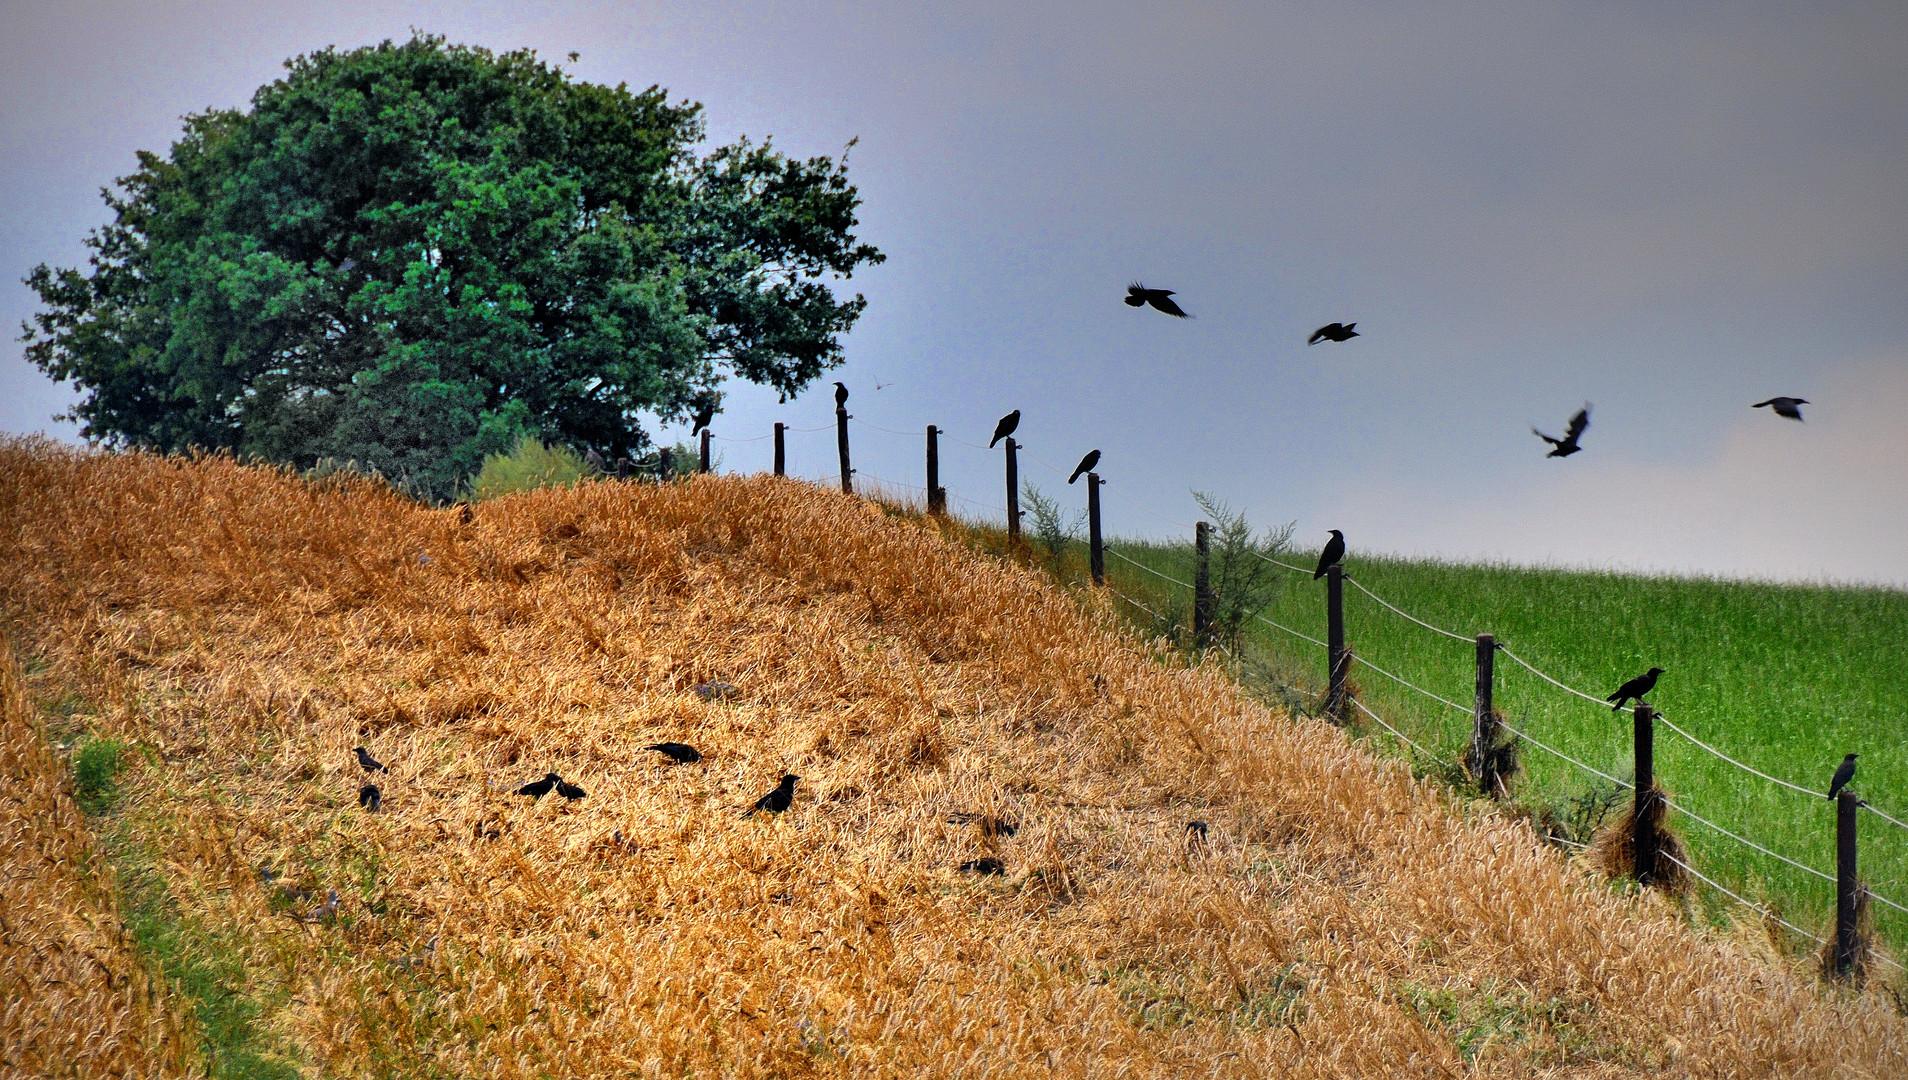 Vögel auf dem Feld